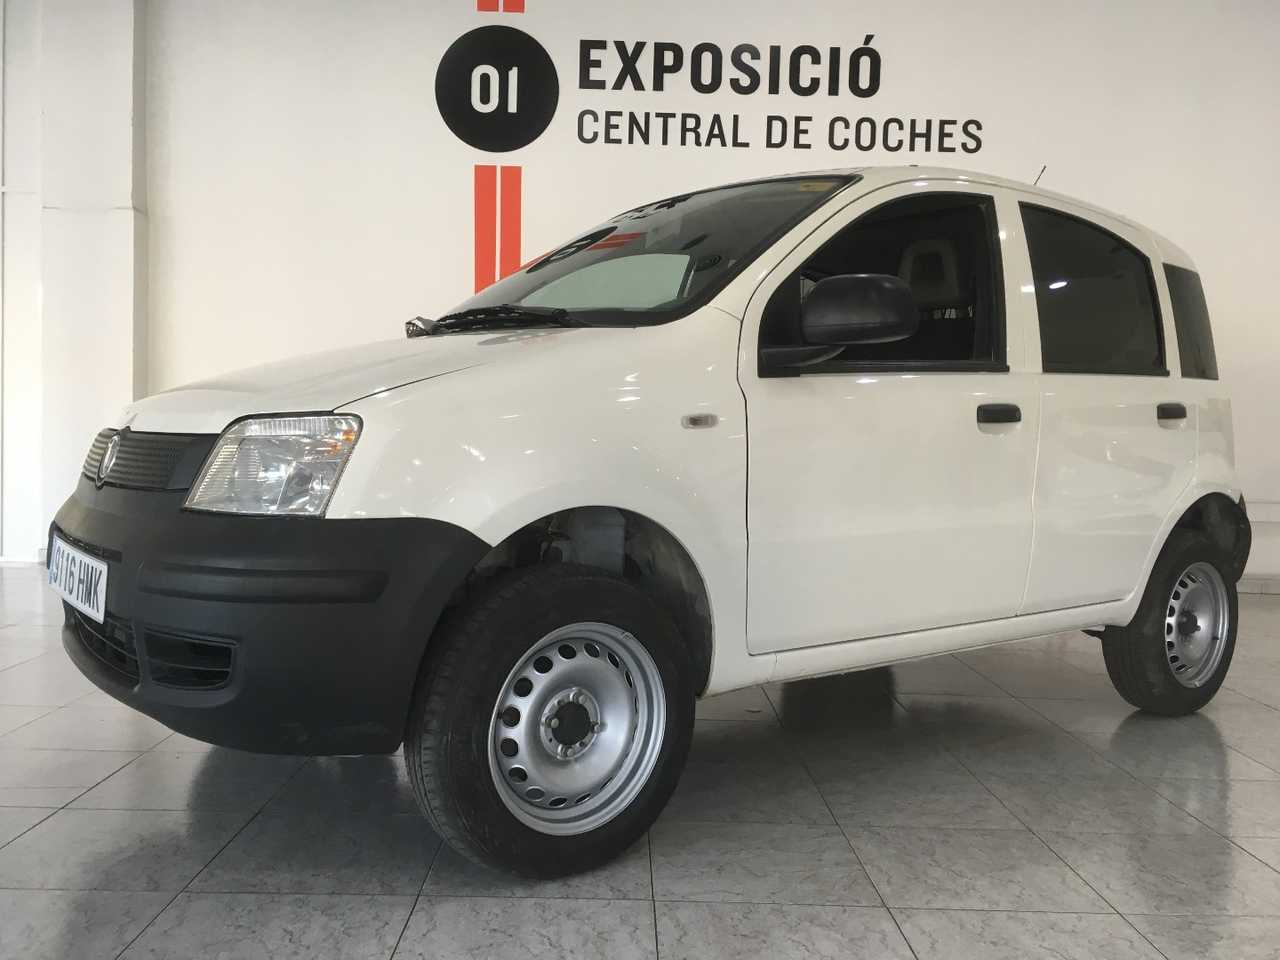 Fiat Panda 4x4 Van  1.3 Mtj  Comercial 2 Asientos   - Foto 1